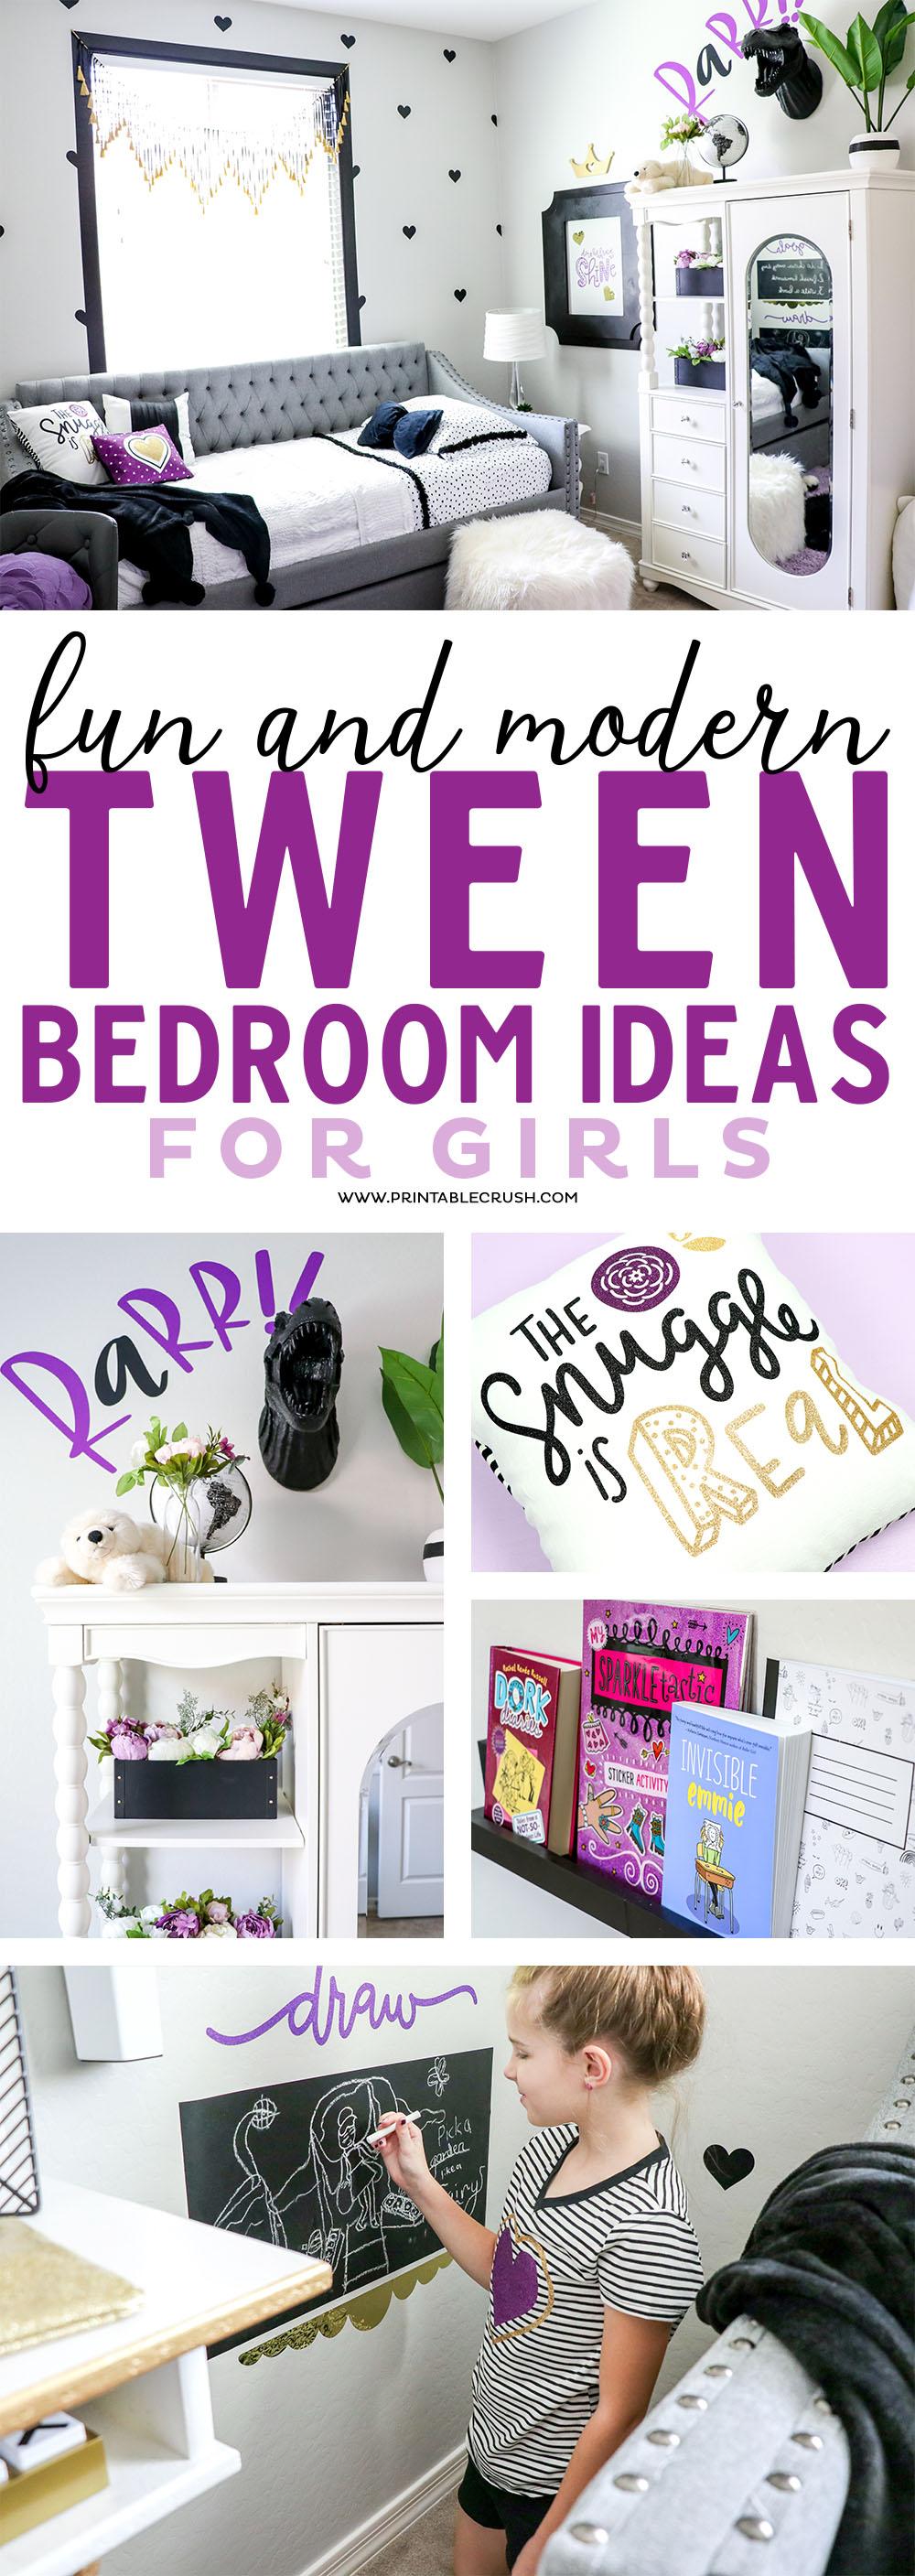 You will LOVE this modern Tween Girls Room design! Plenty of decor ideas to decorate your own creative space. #tweenbedroom #tweenroomsideas #tweenroom #kidroomideas #homedecor via @printablecrush